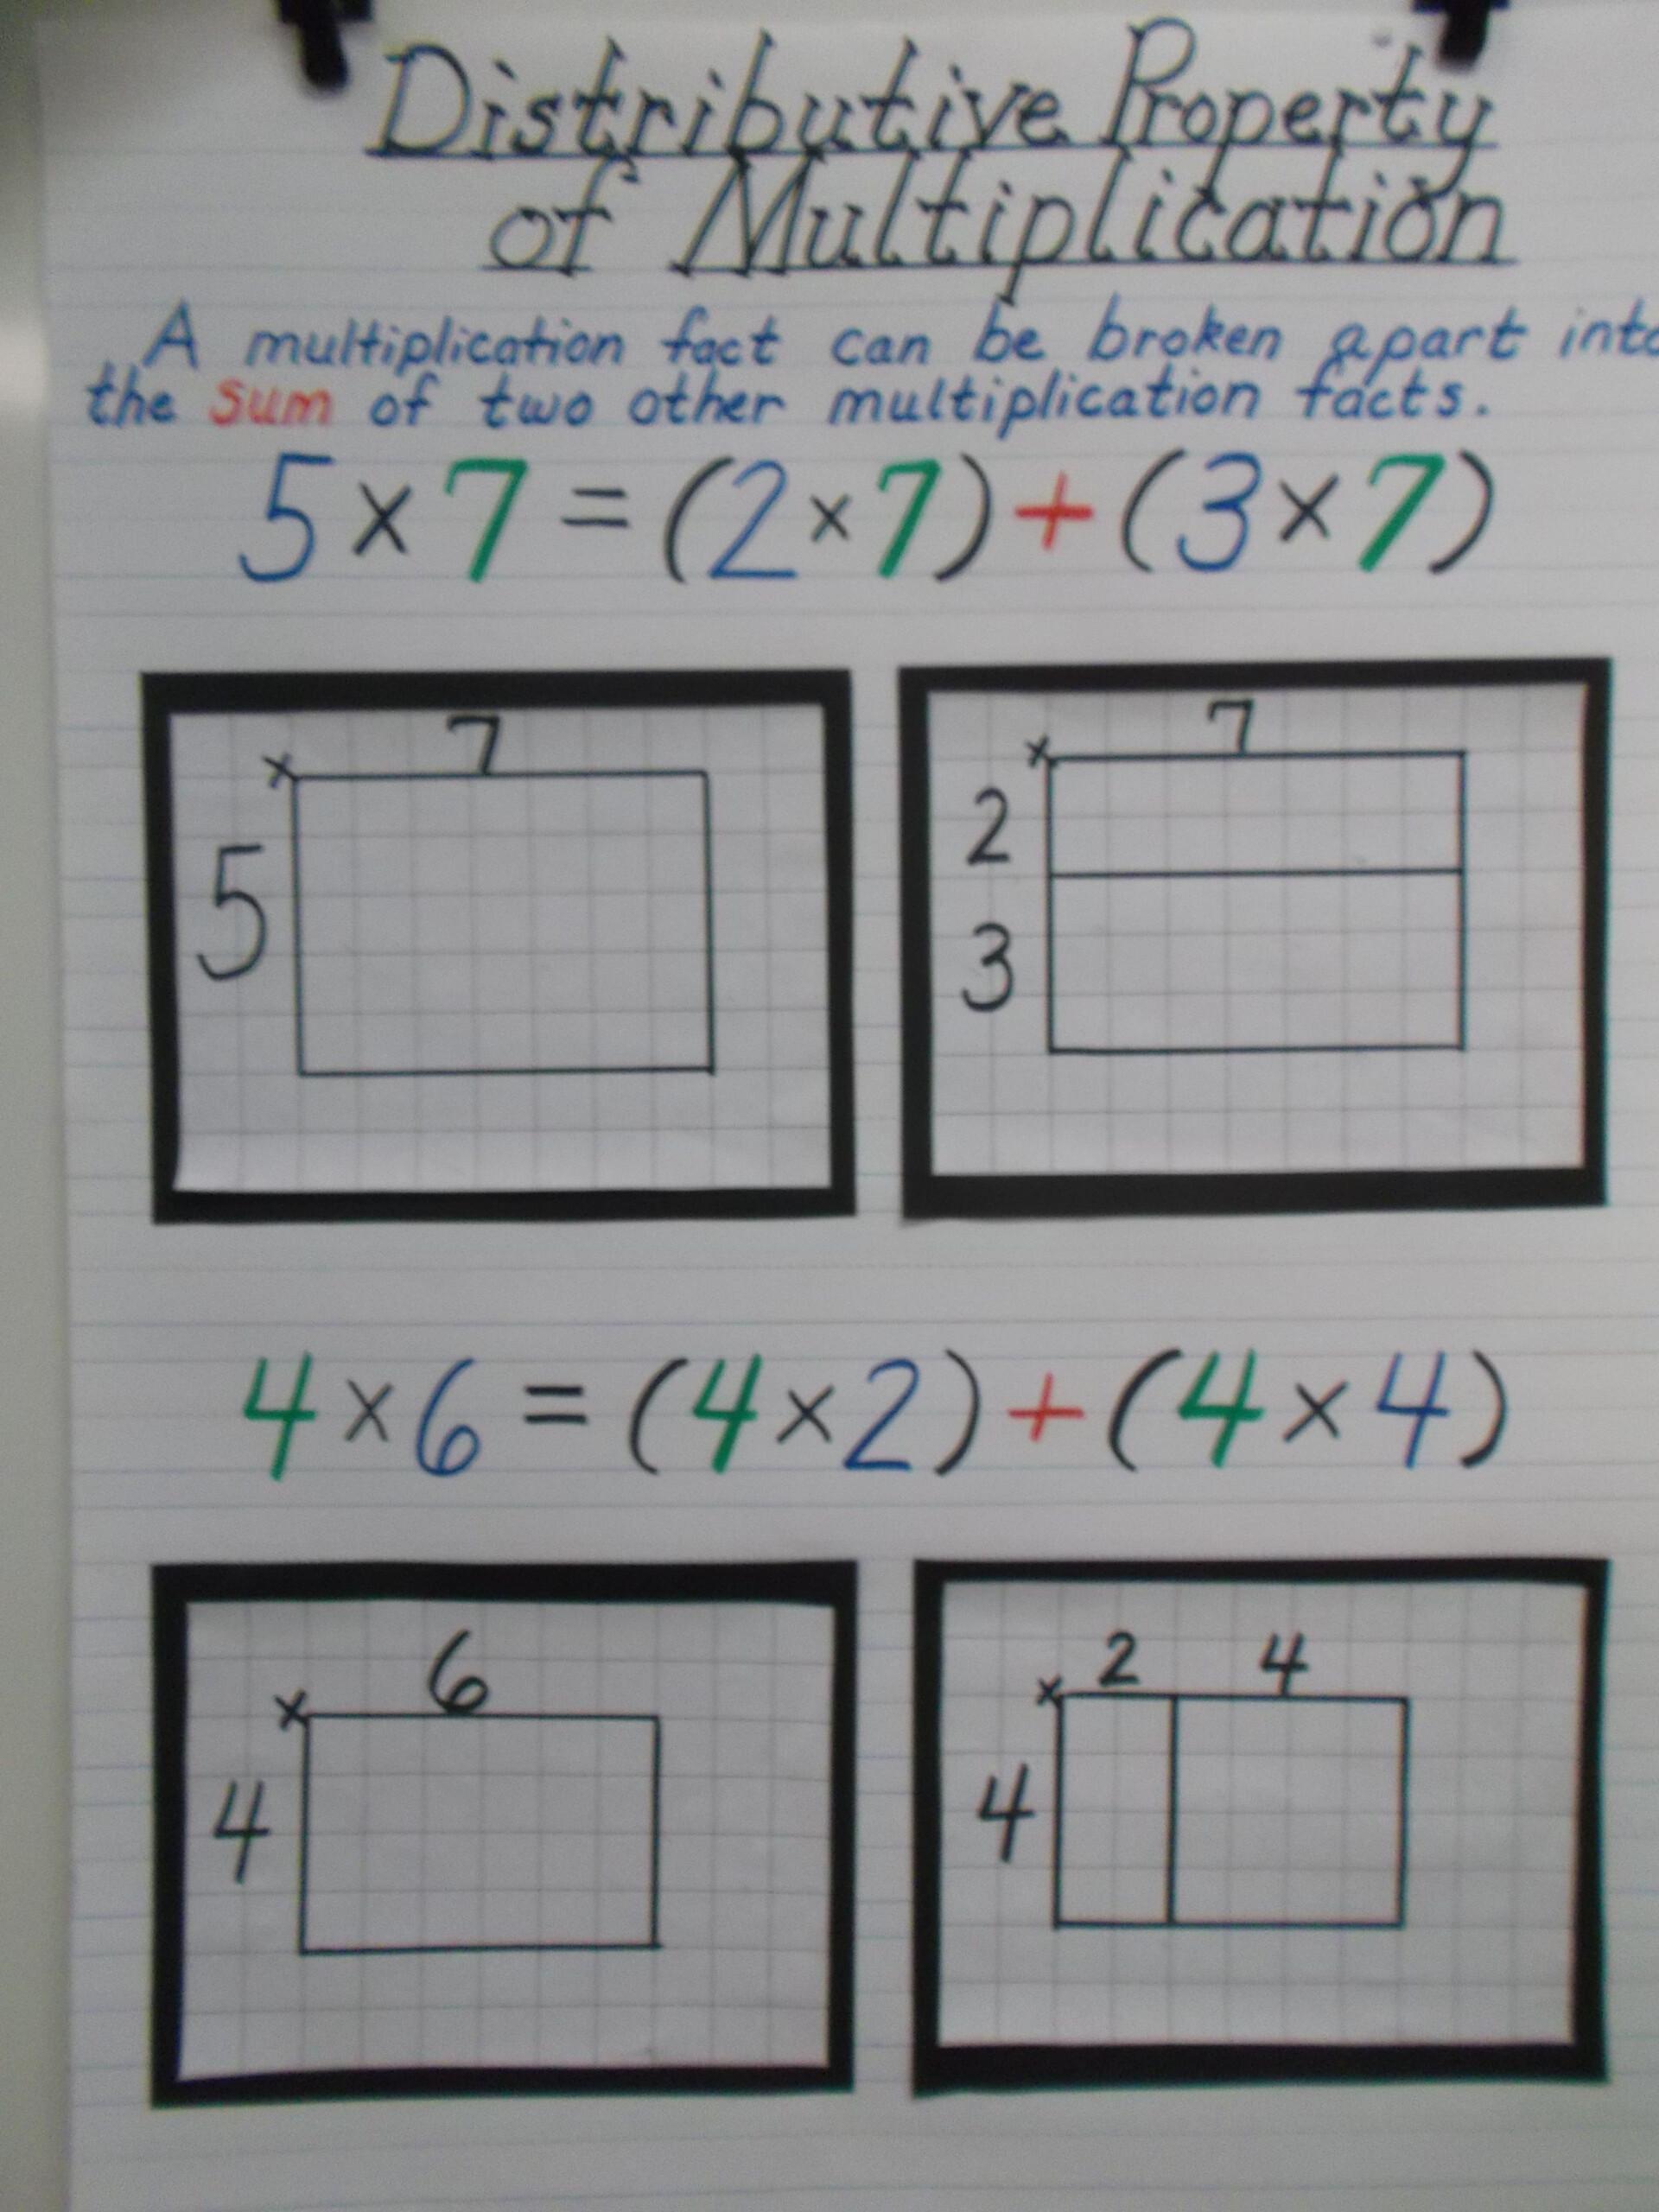 Distributive Property Of Multiplication Anchor Chart | Math